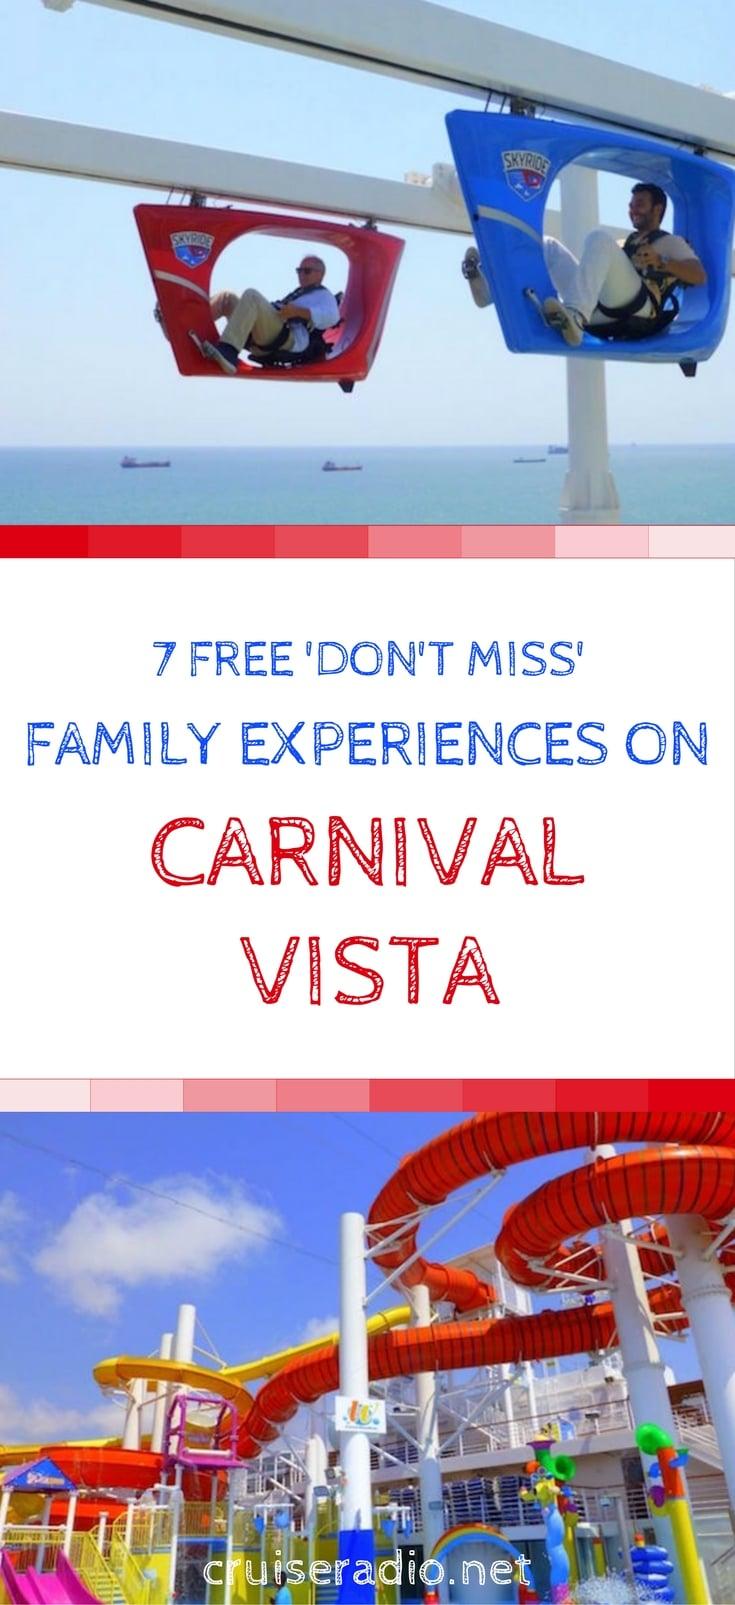 #carnival #carnivalvista #ship #cruise #cruising #familytravel #travel